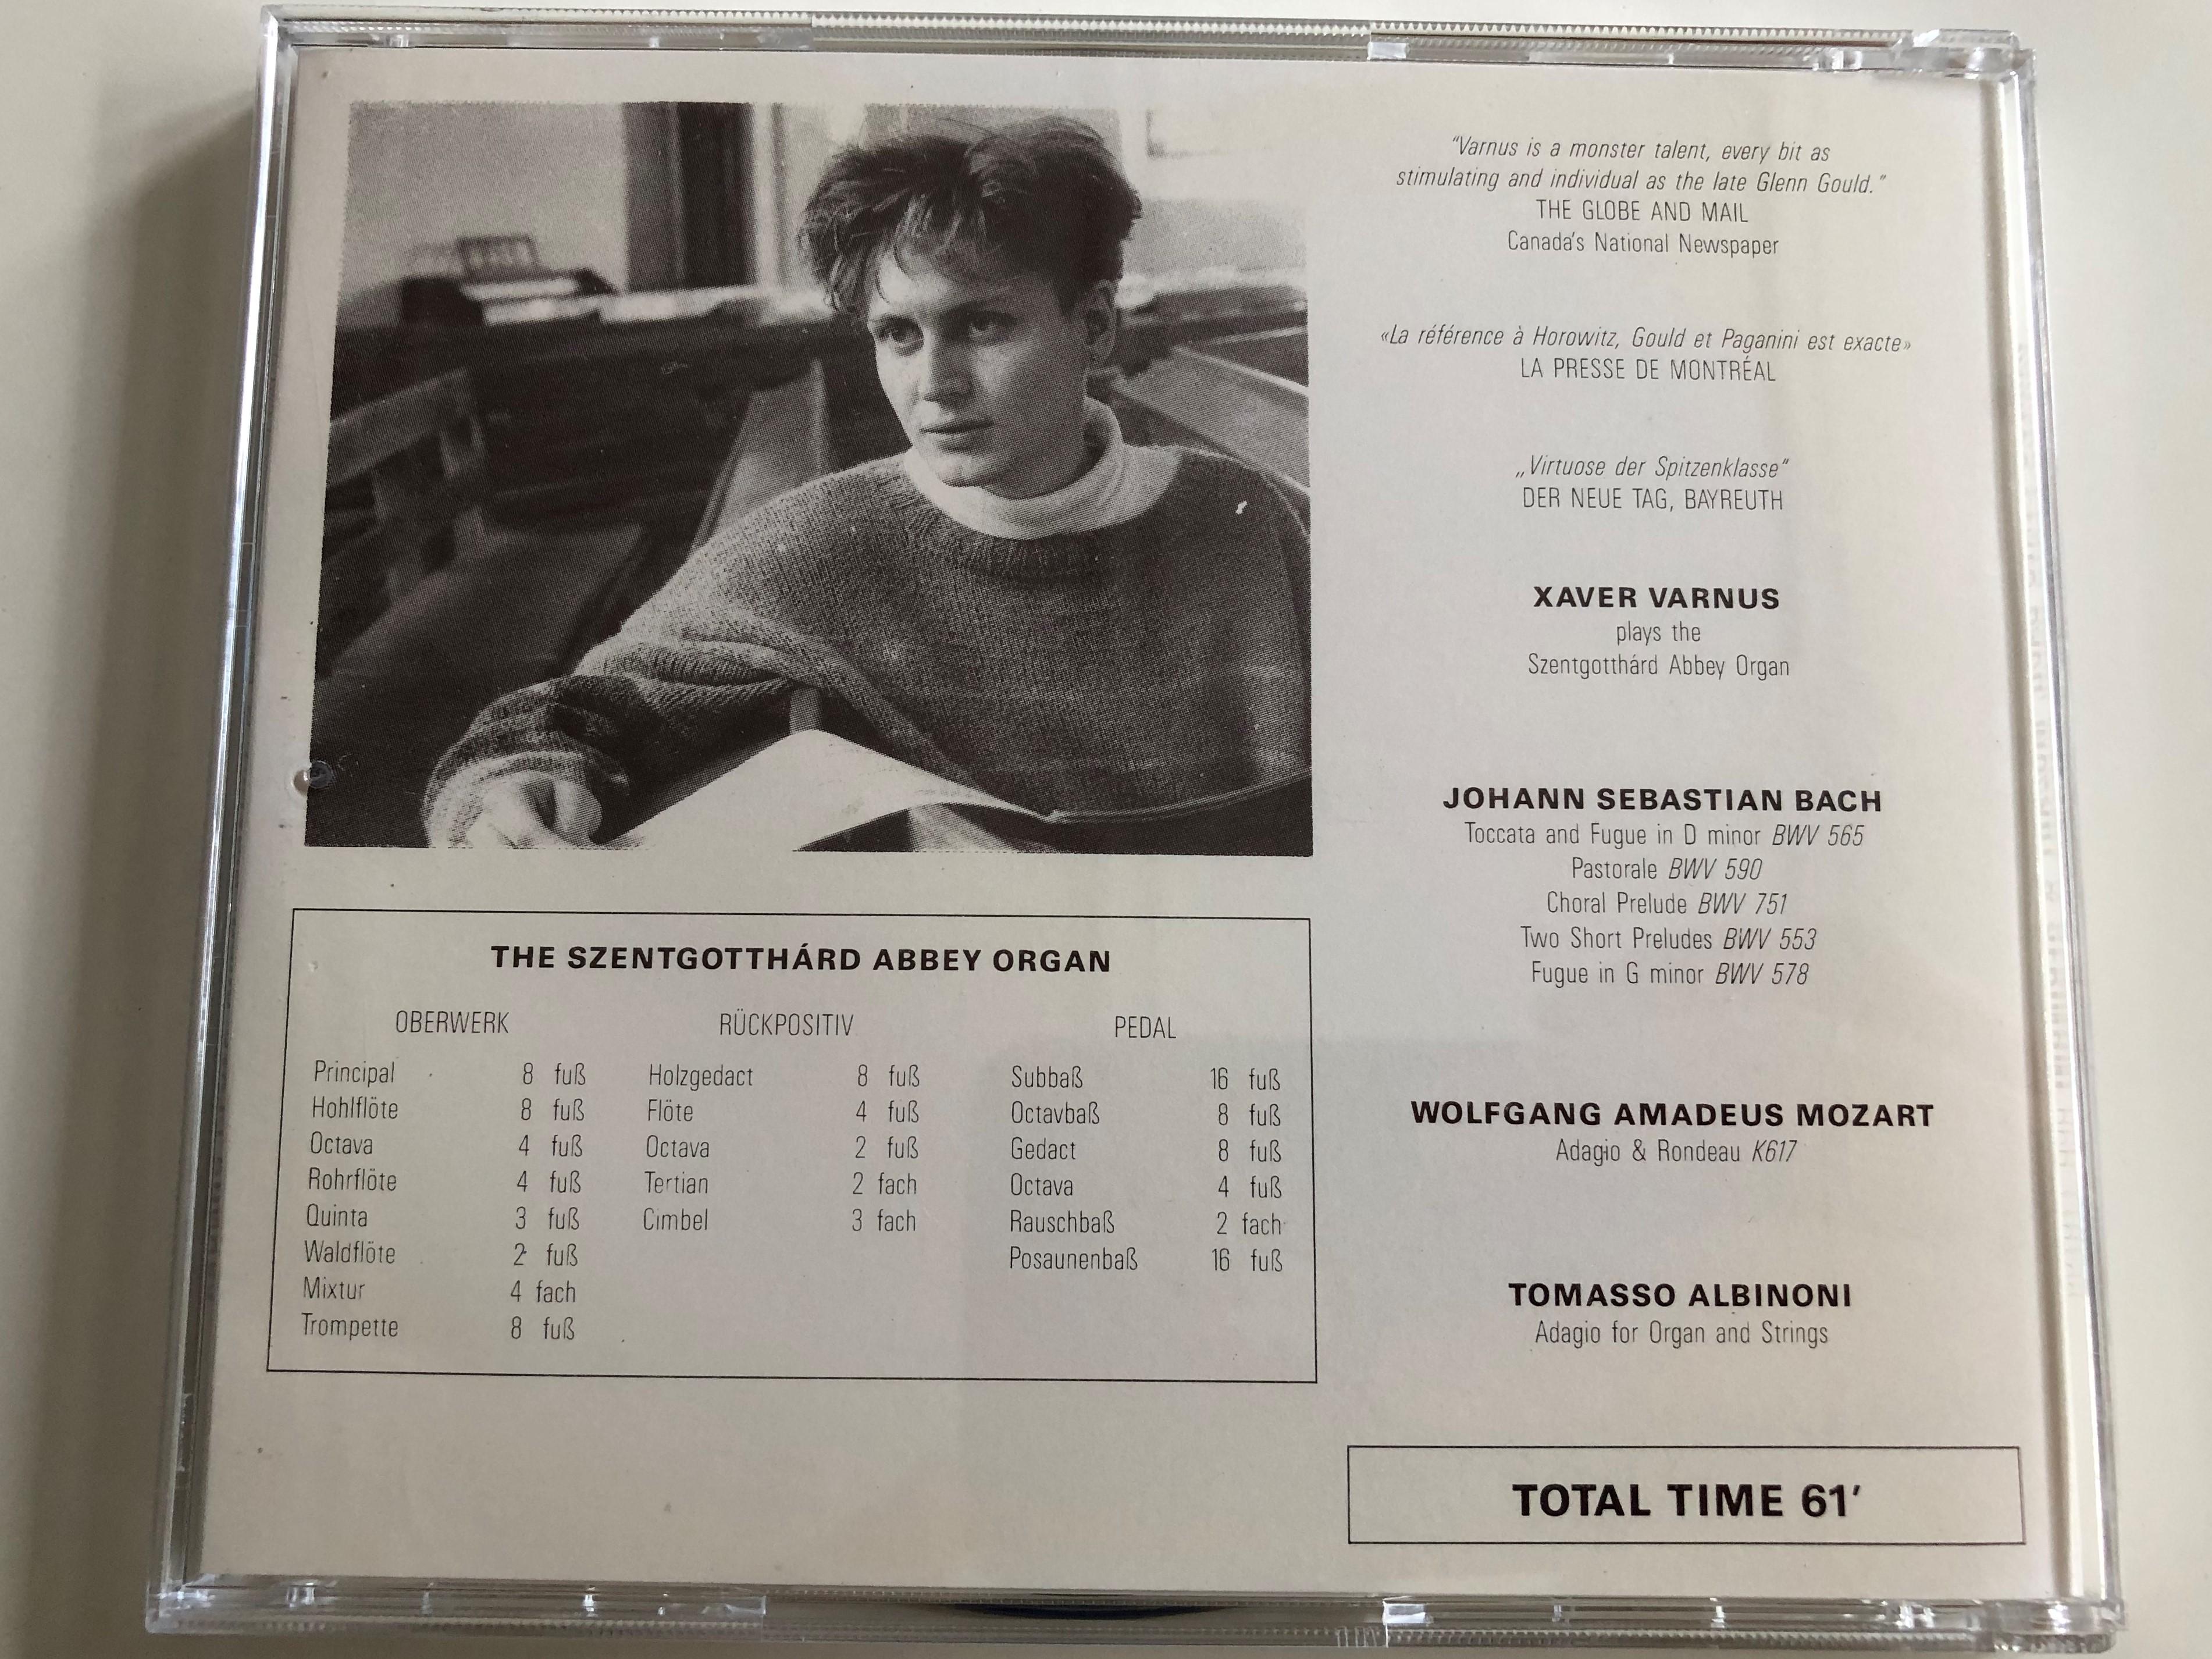 organ-magic-legendary-virtuoso-xaver-varnus-plays-the-baroque-organ-of-szentgotth-rd-abbey-bach-toccata-fugue-in-d-minor-mozart-adagio-rondeau-albinoni-adagio-hungaroton-bcd-770755-audio-cd-1992-6-.jpg